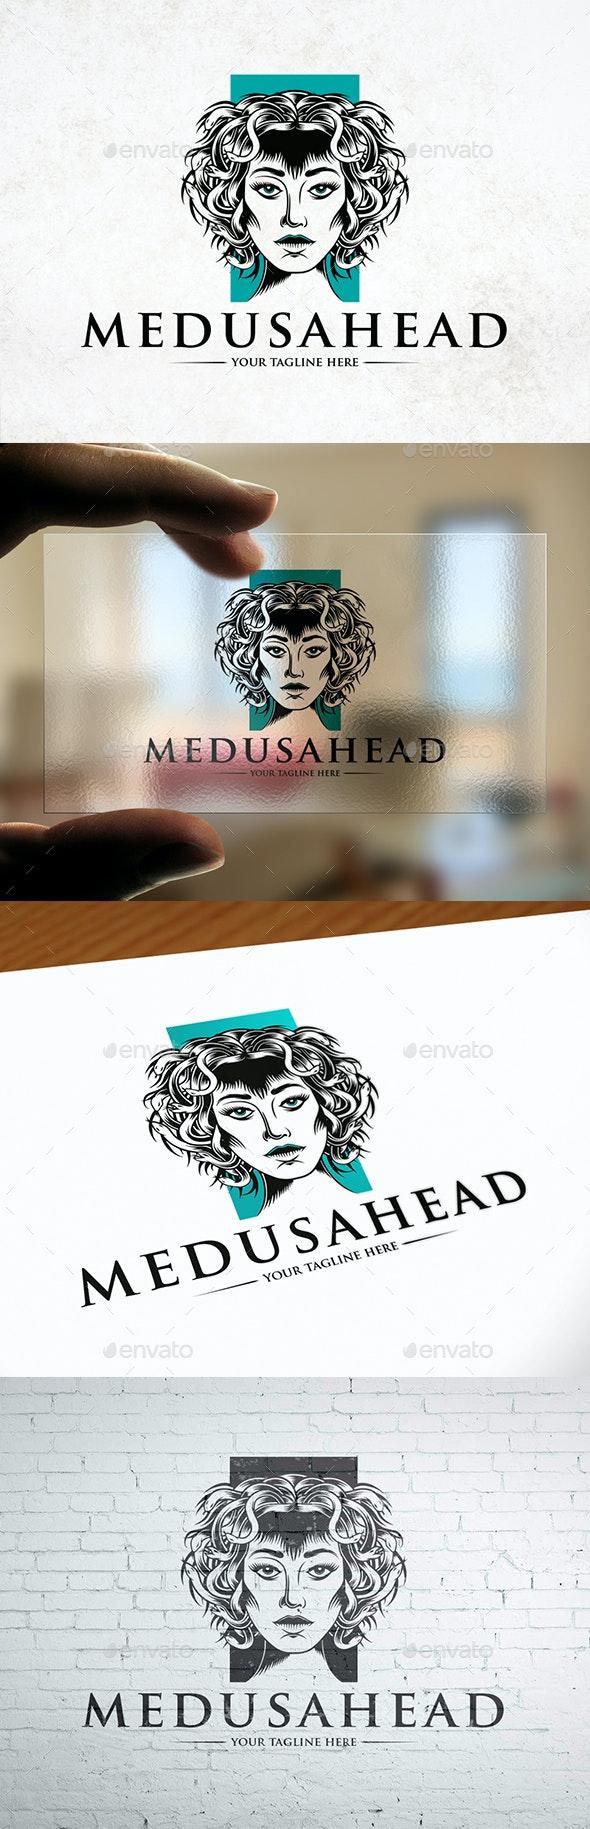 Medusa Head Logo Template